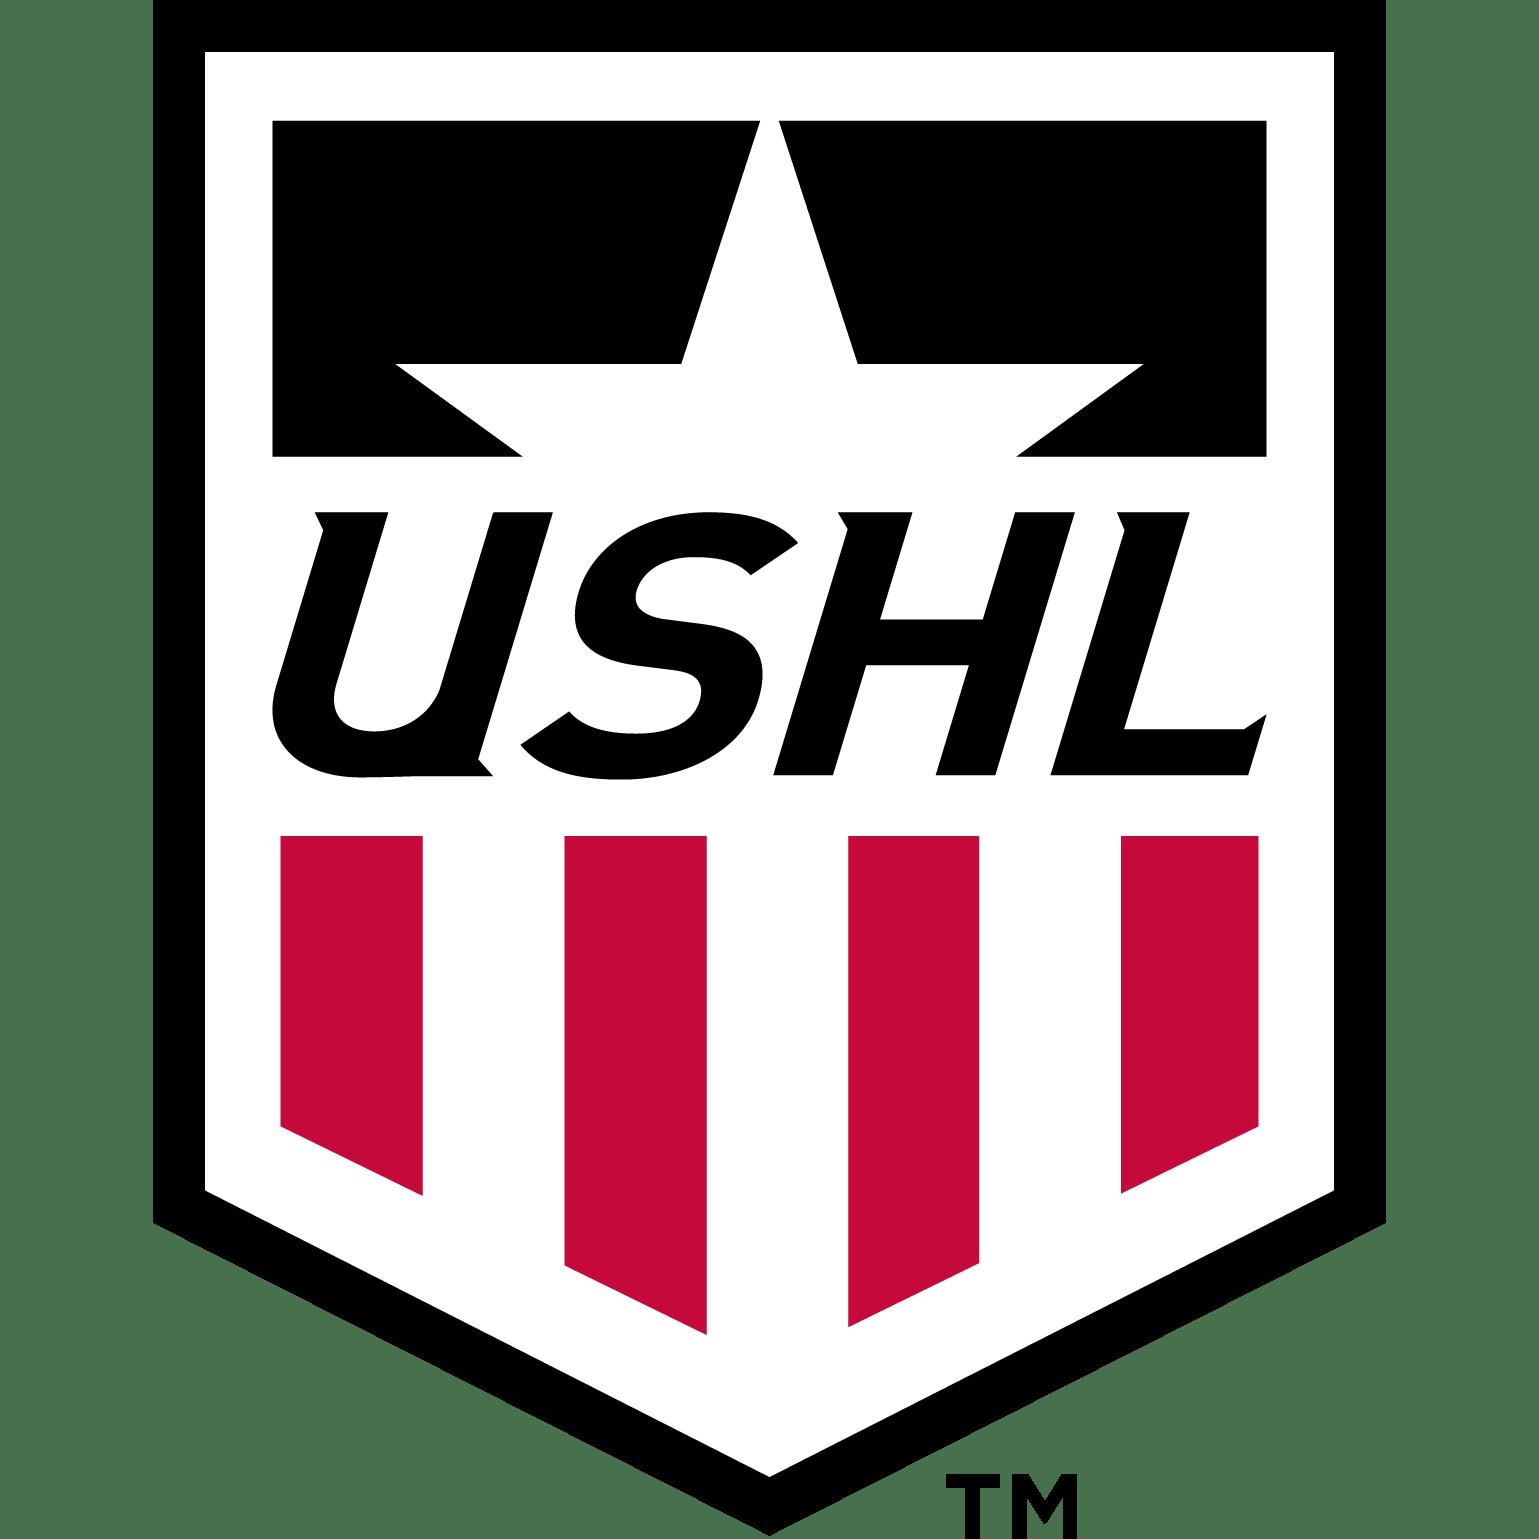 ushl-logo